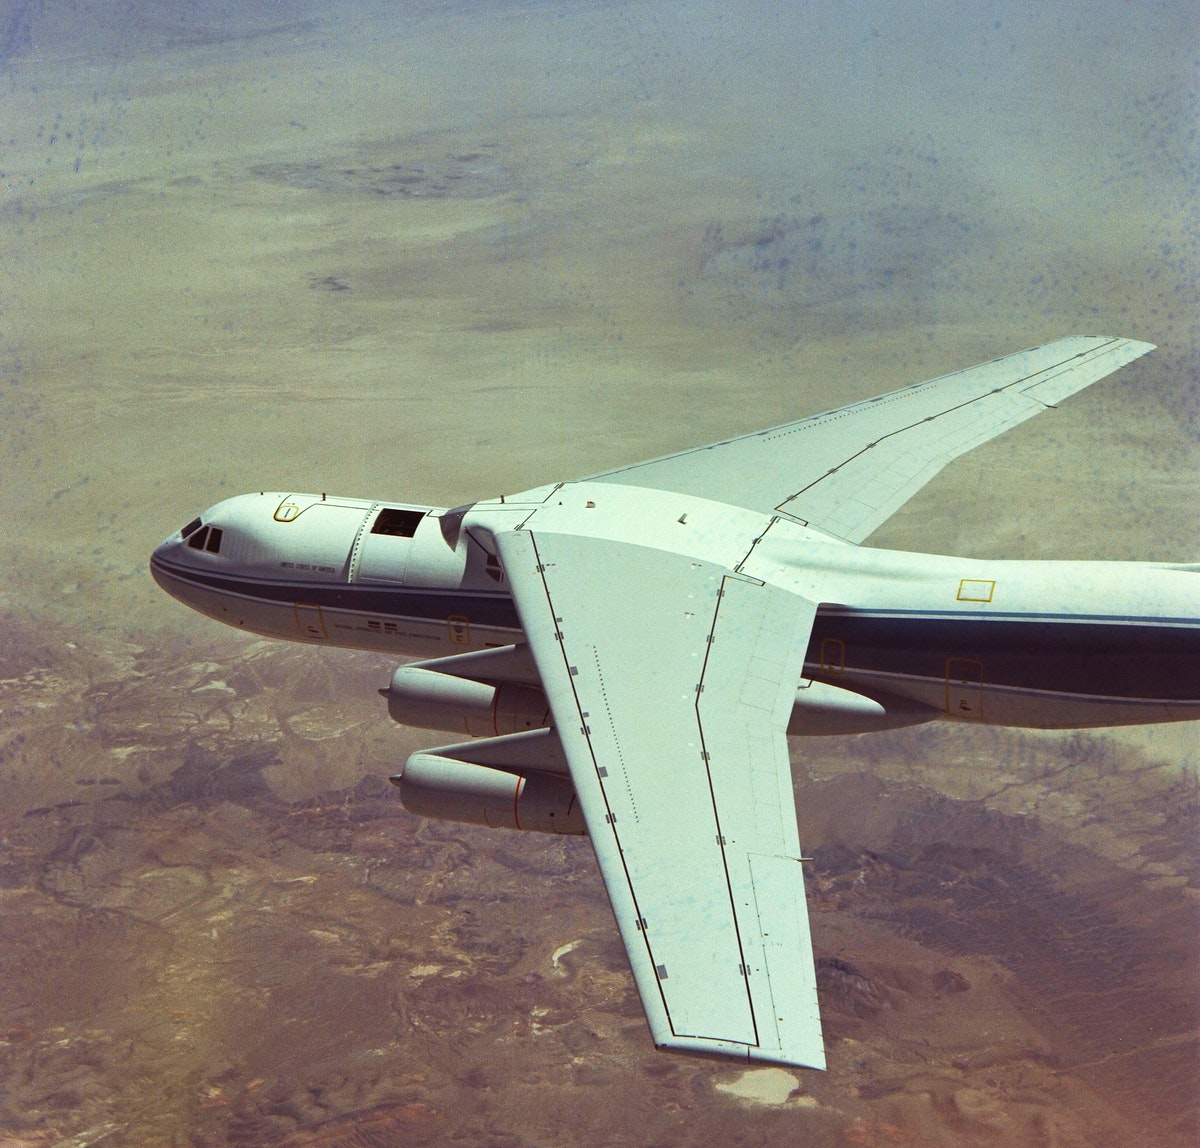 C-141 (NASA-714) Kuipter Airborne Observatory in flight, telescope hatch open. Original from NASA. Digitally enhanced by…